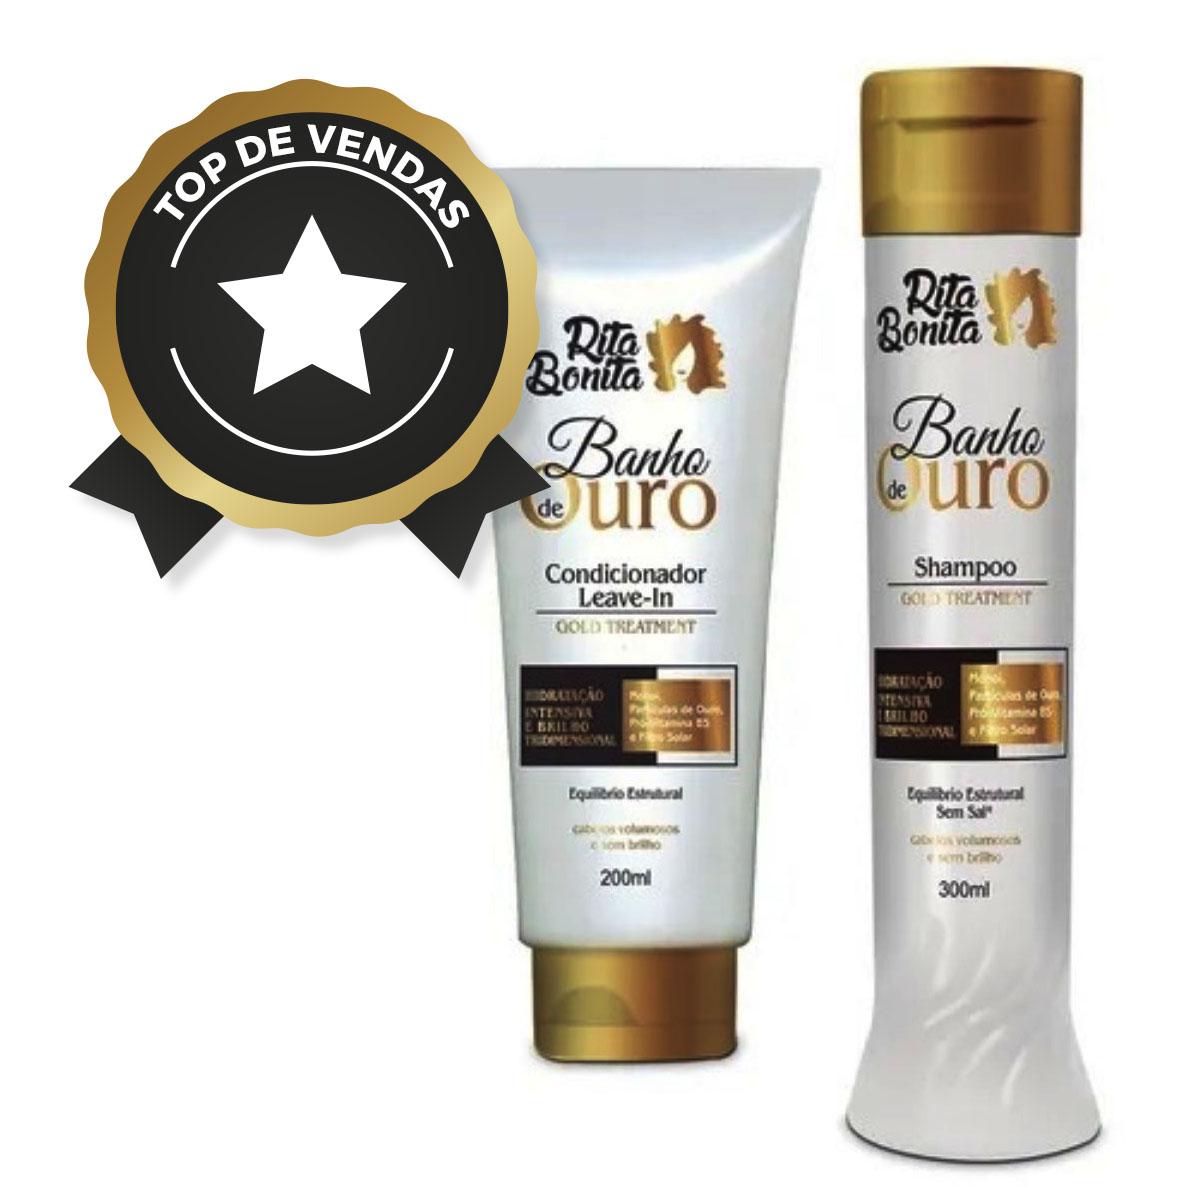 Banho de Ouro - Kit Rita Bonita  Duo Home Care (2 Produtos)